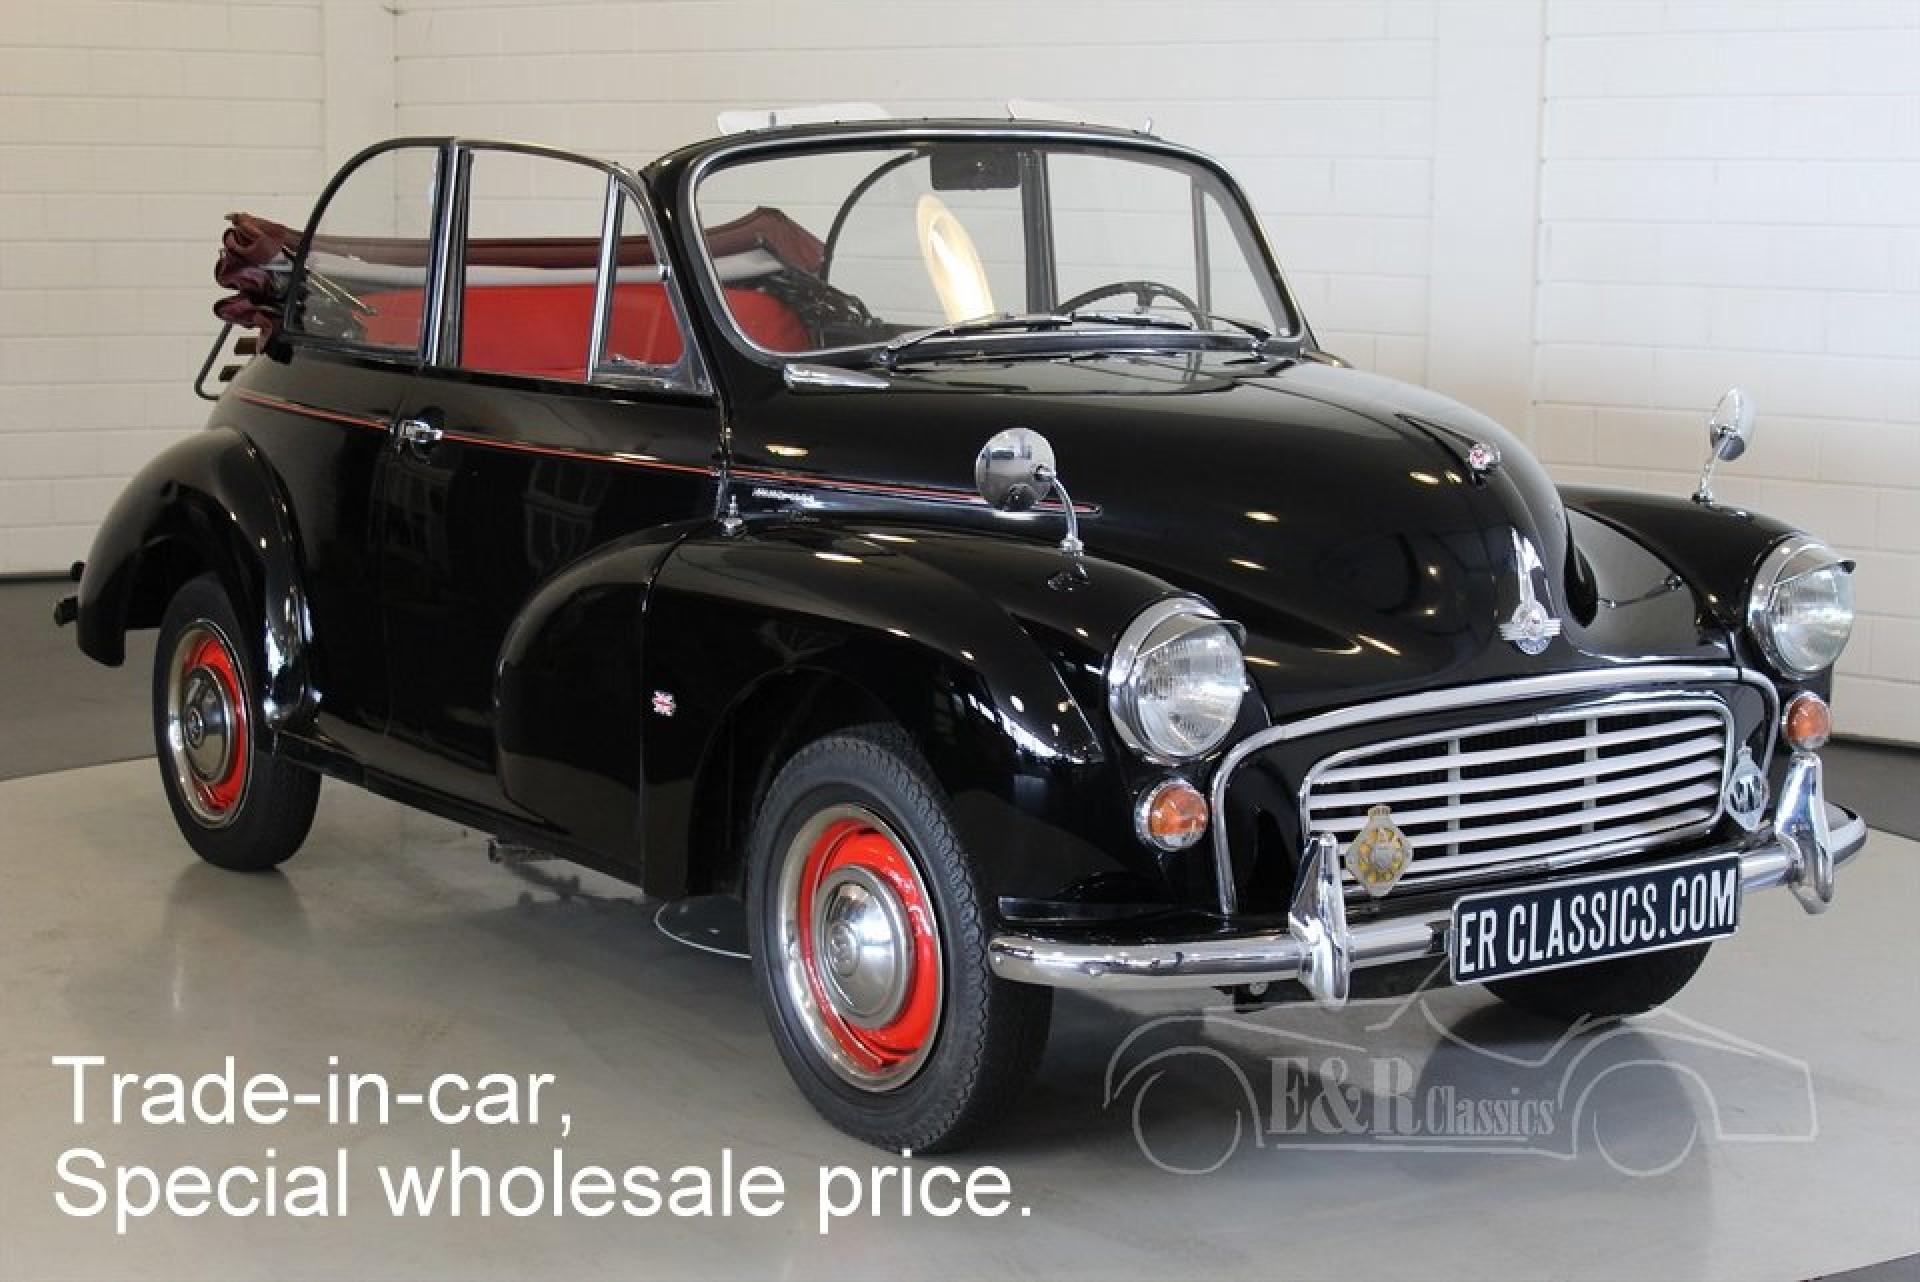 Morris Minor 1000 cabriolet 1960 for sale at ERclassics